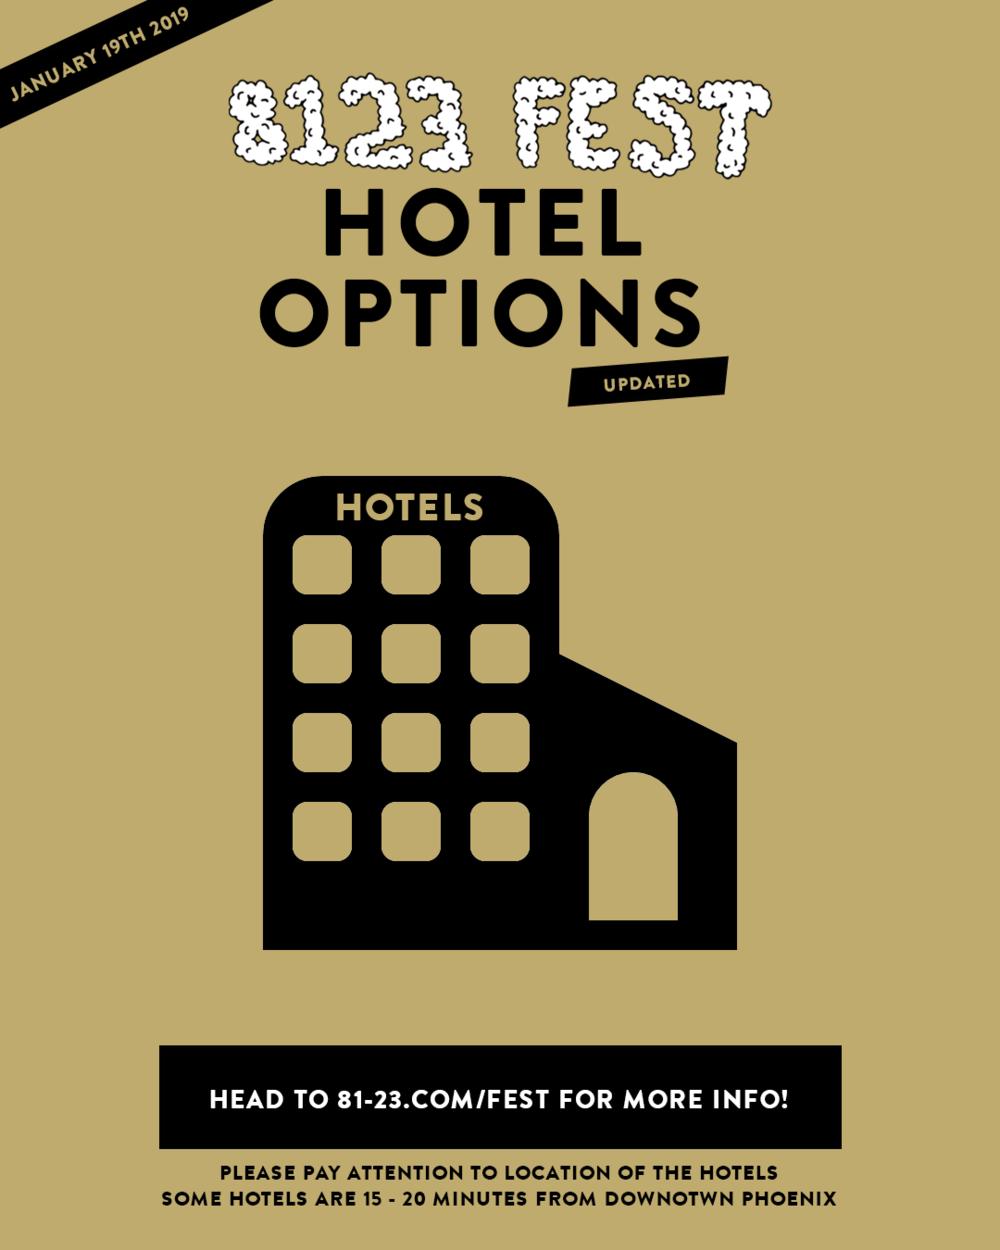 8123 fest - hotels.png